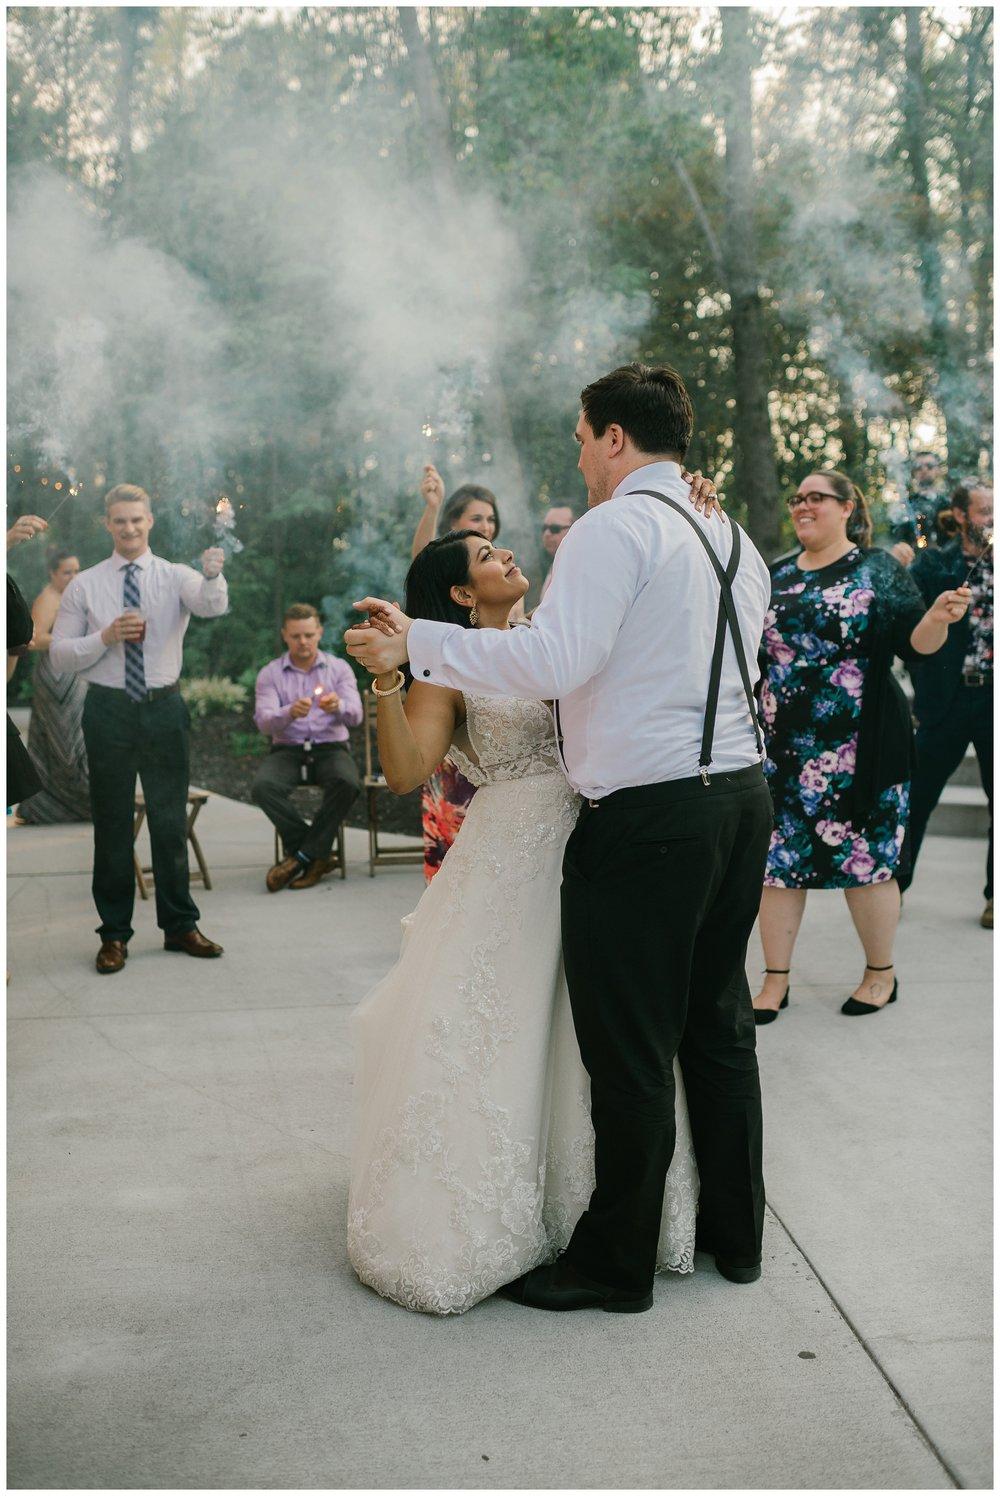 Rebecca_Bridges_Photography_Indianapolis_Wedding_Photographer_7000.jpg